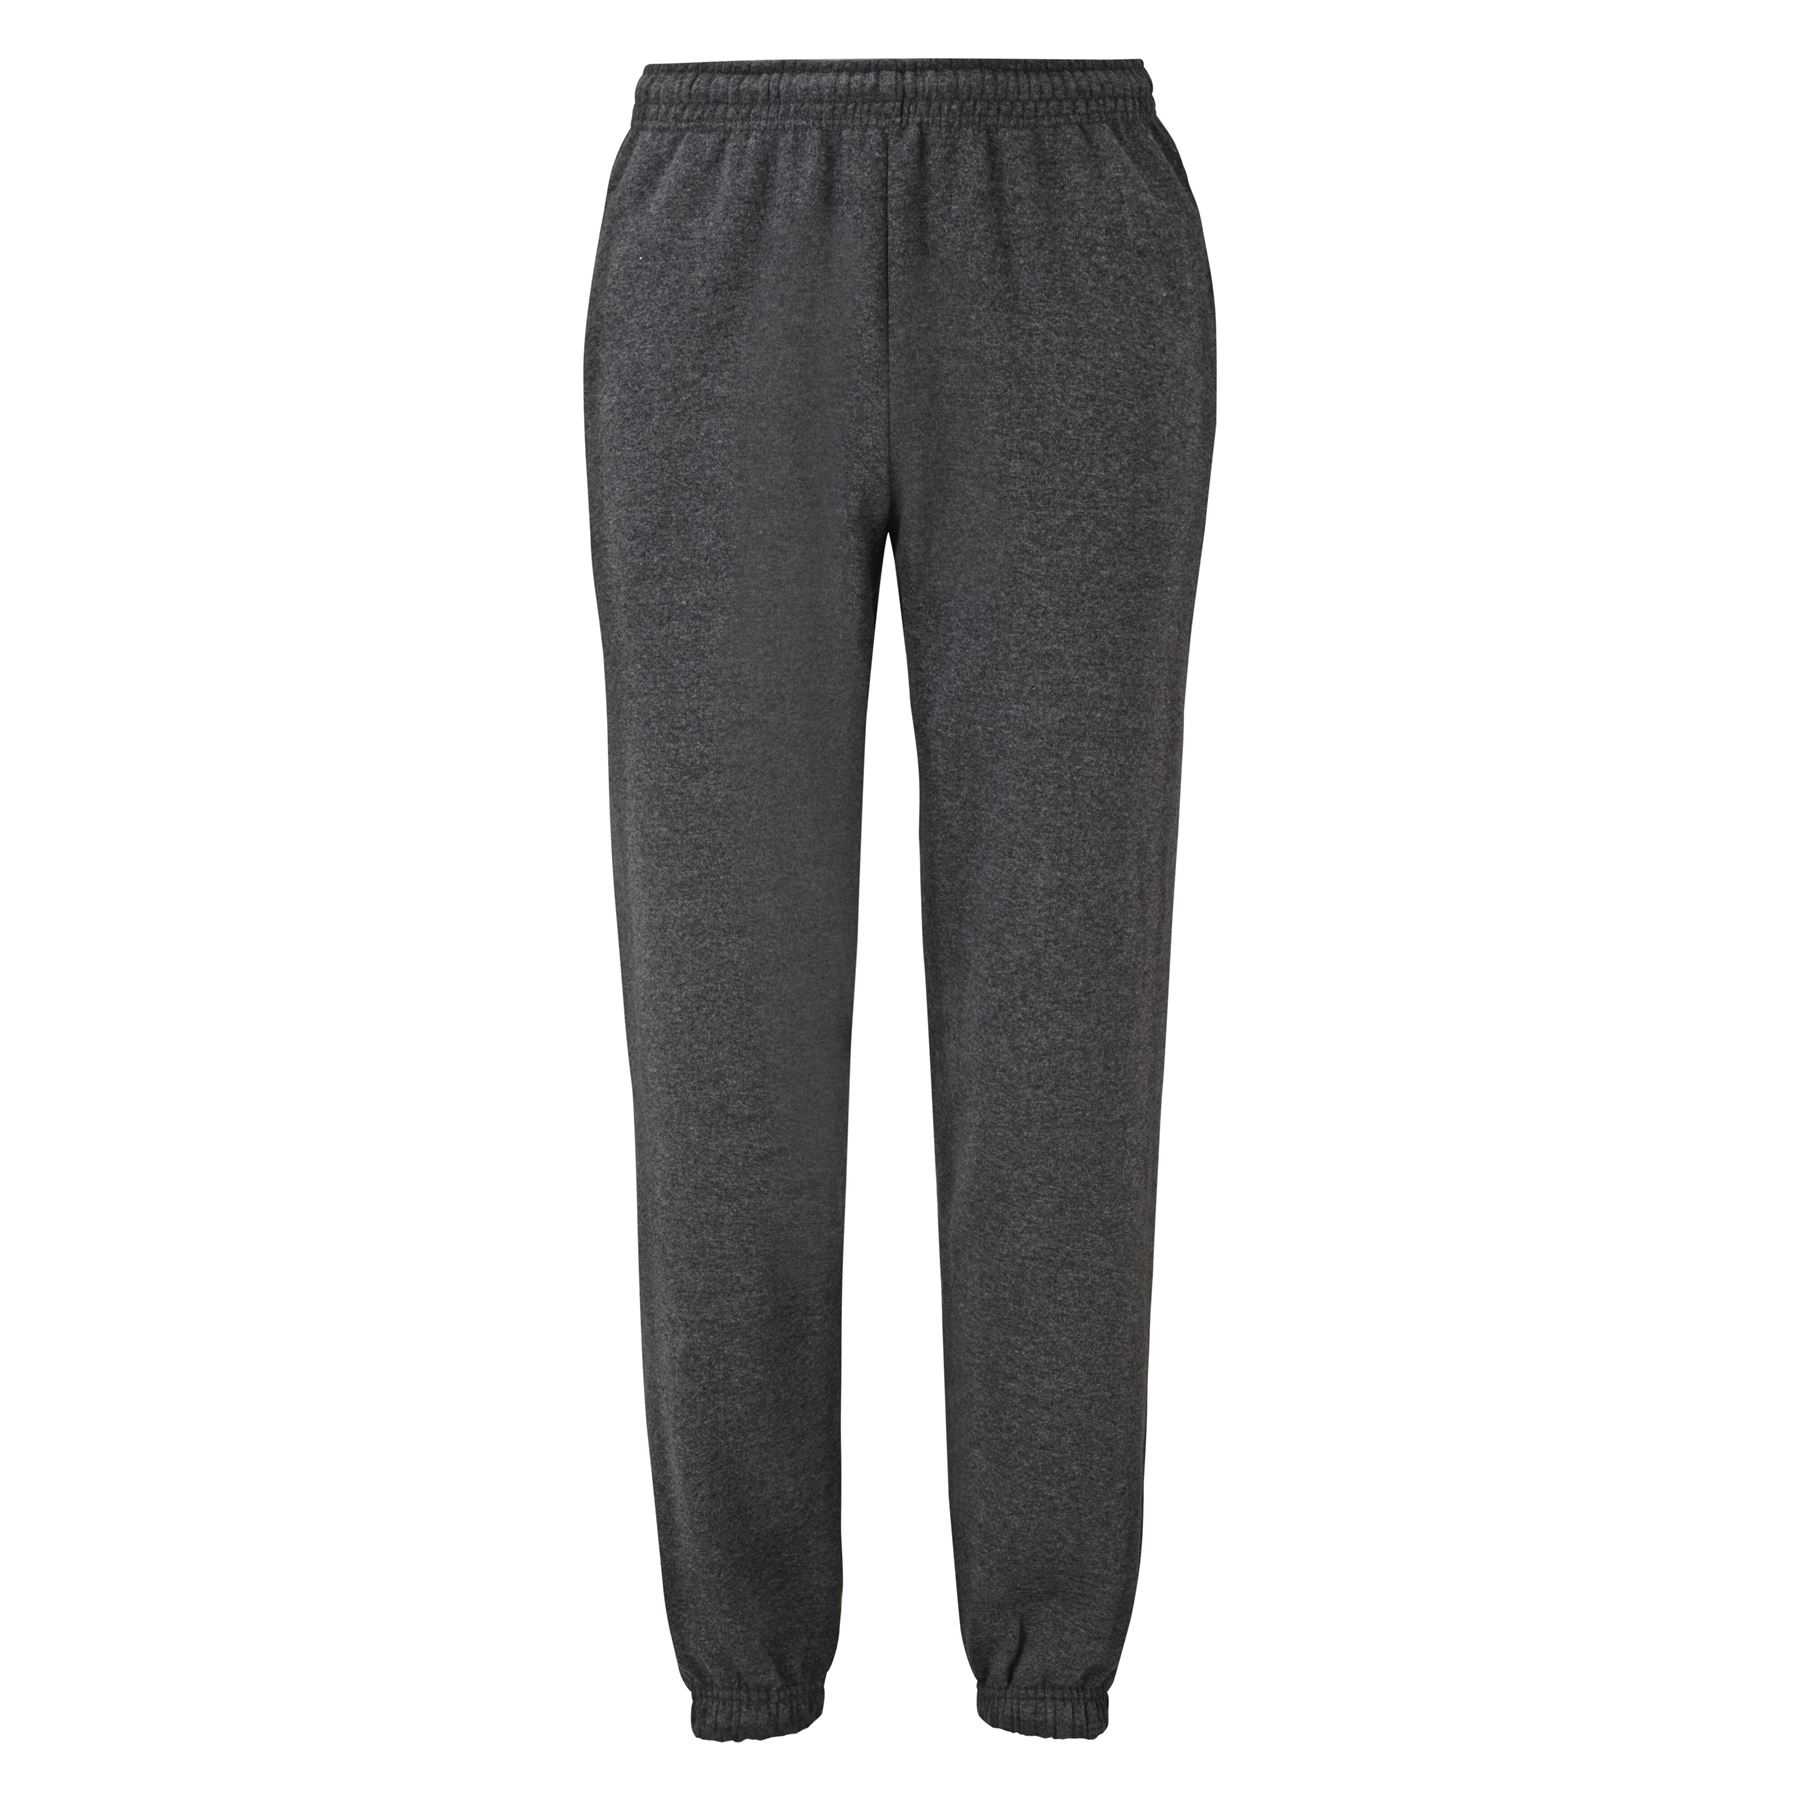 Da Uomo Fruit of the Loom Classico Elasticizzato Jogging Sudore Pantaloni pantaloni pantaloni sportivi